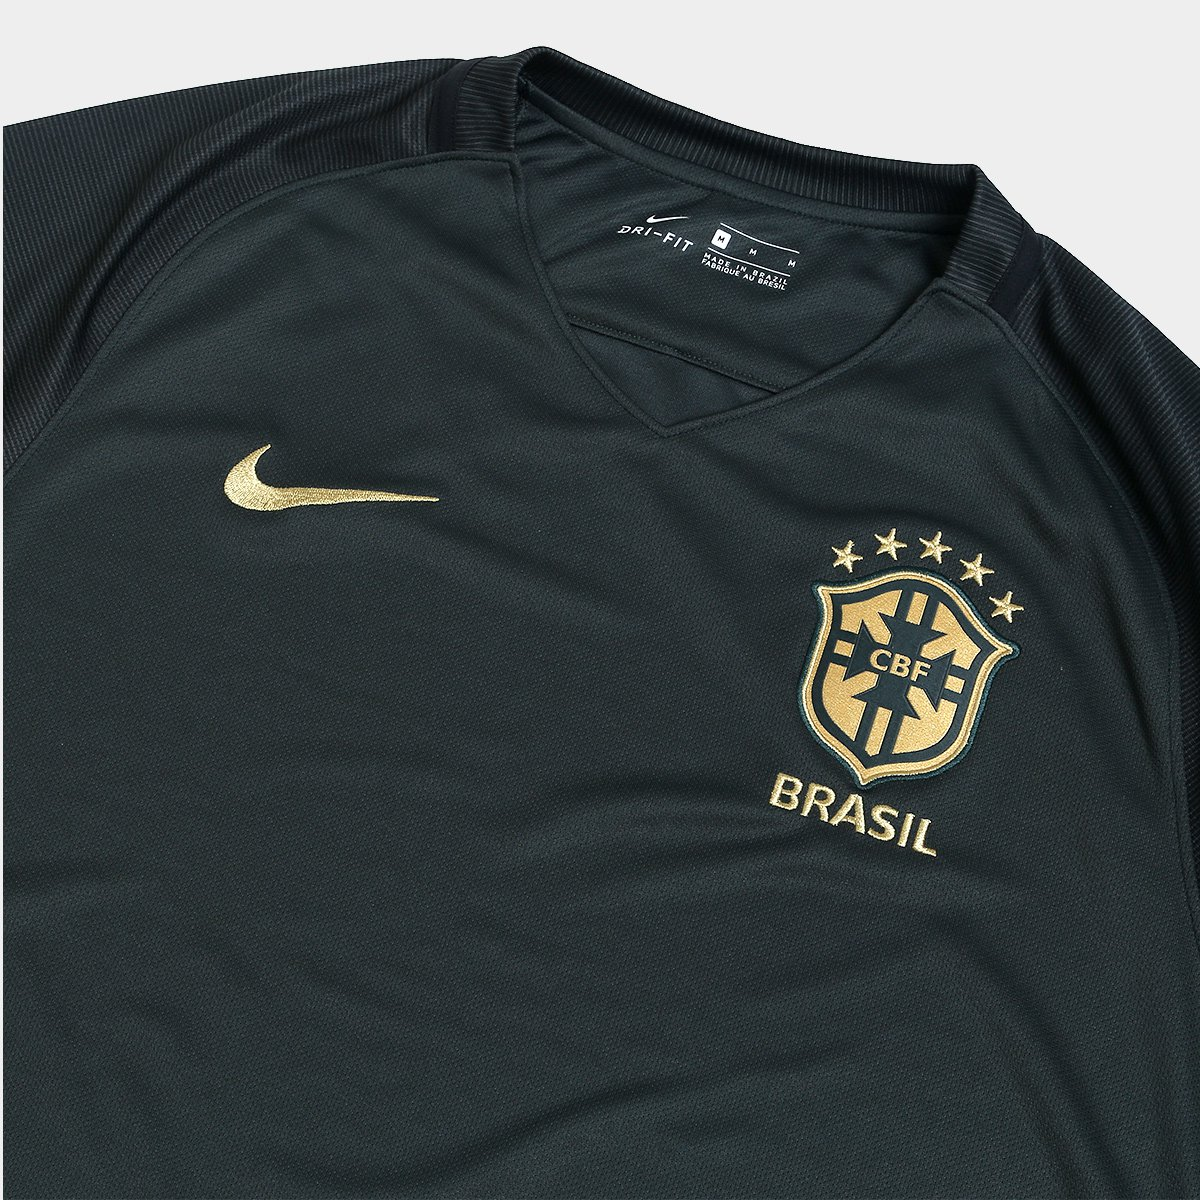 Camisa Seleção Brasil III 17 18 s nº Torcedor Nike Masculina ... 9bca76c93a1b5